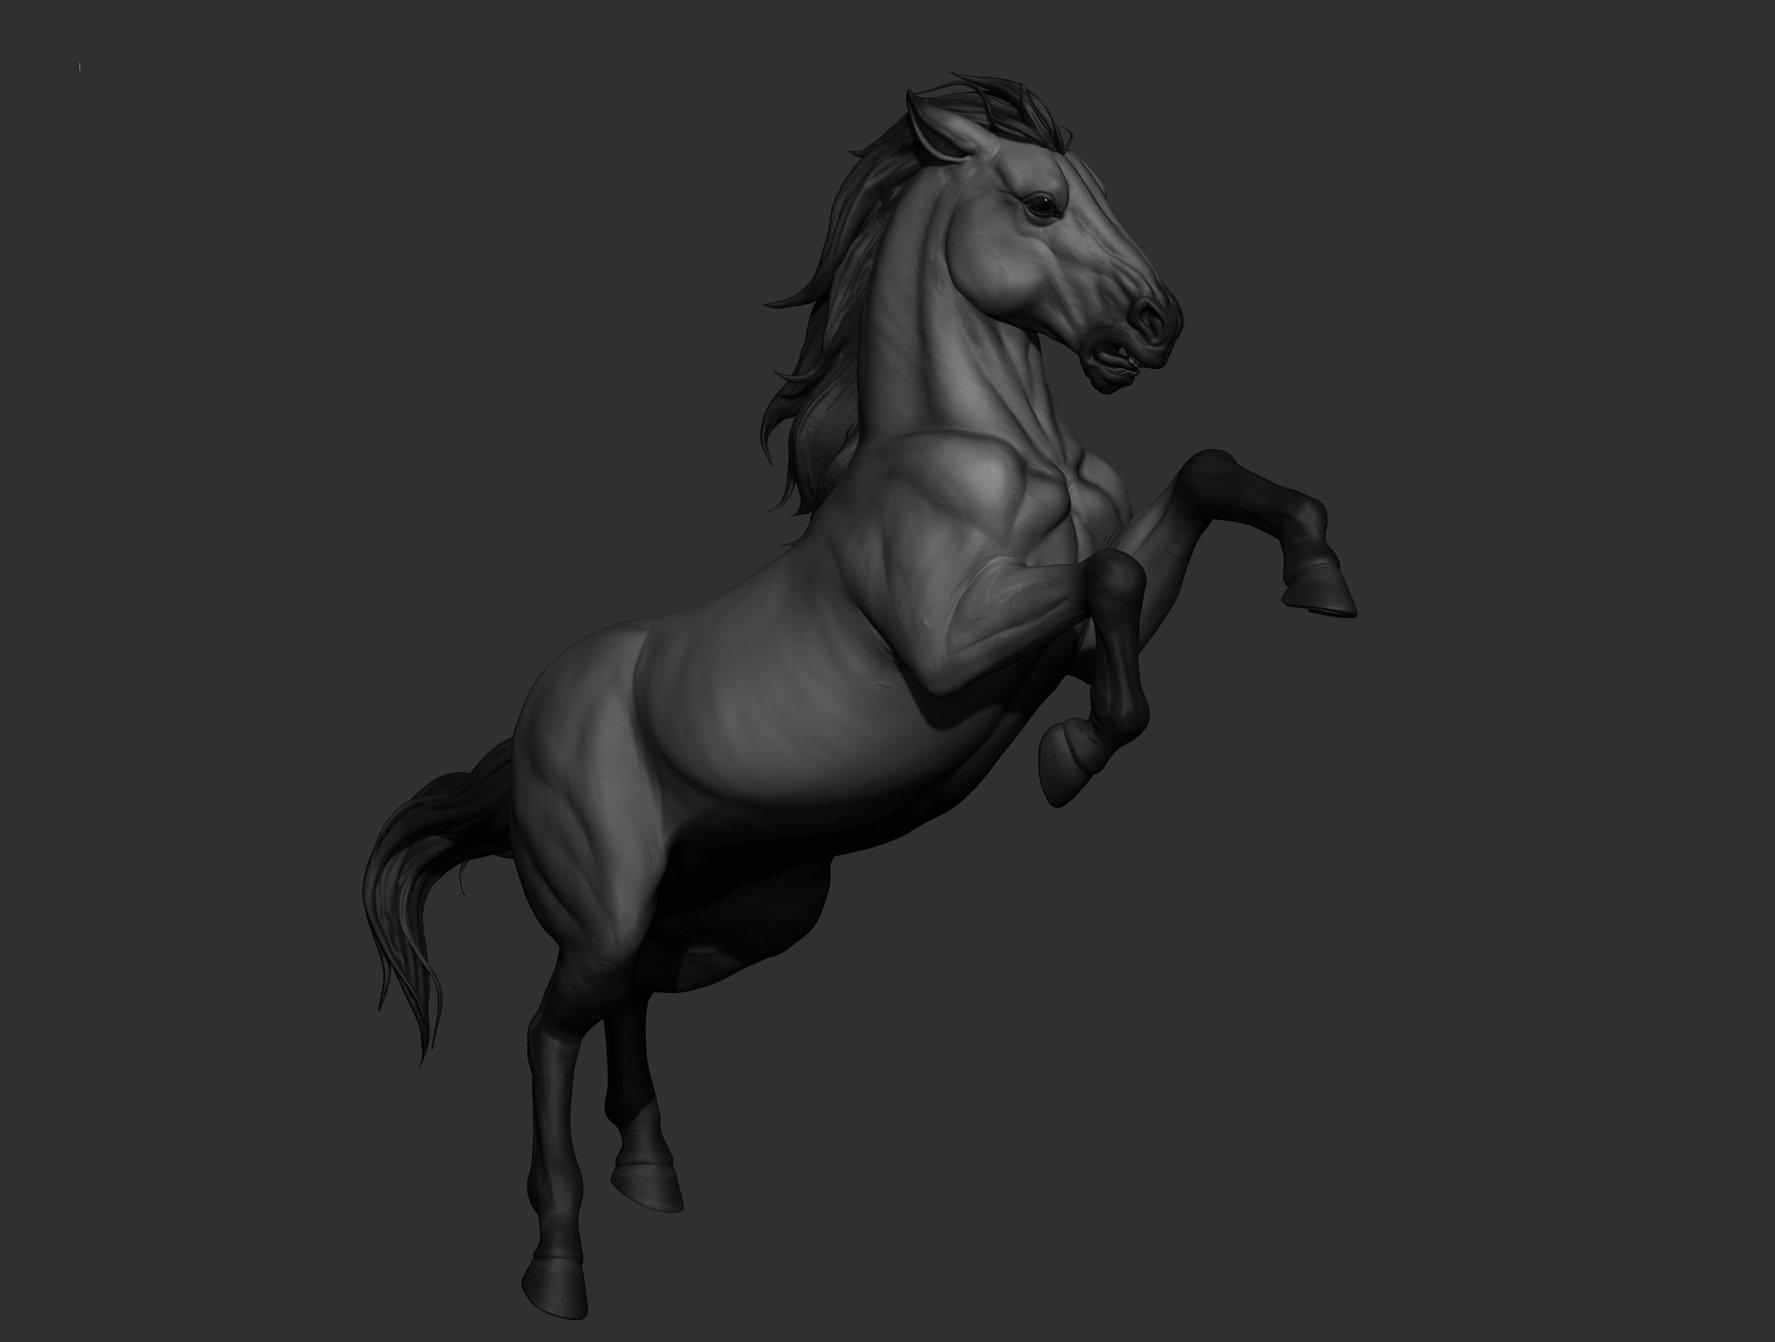 Krystal sae eua horse01